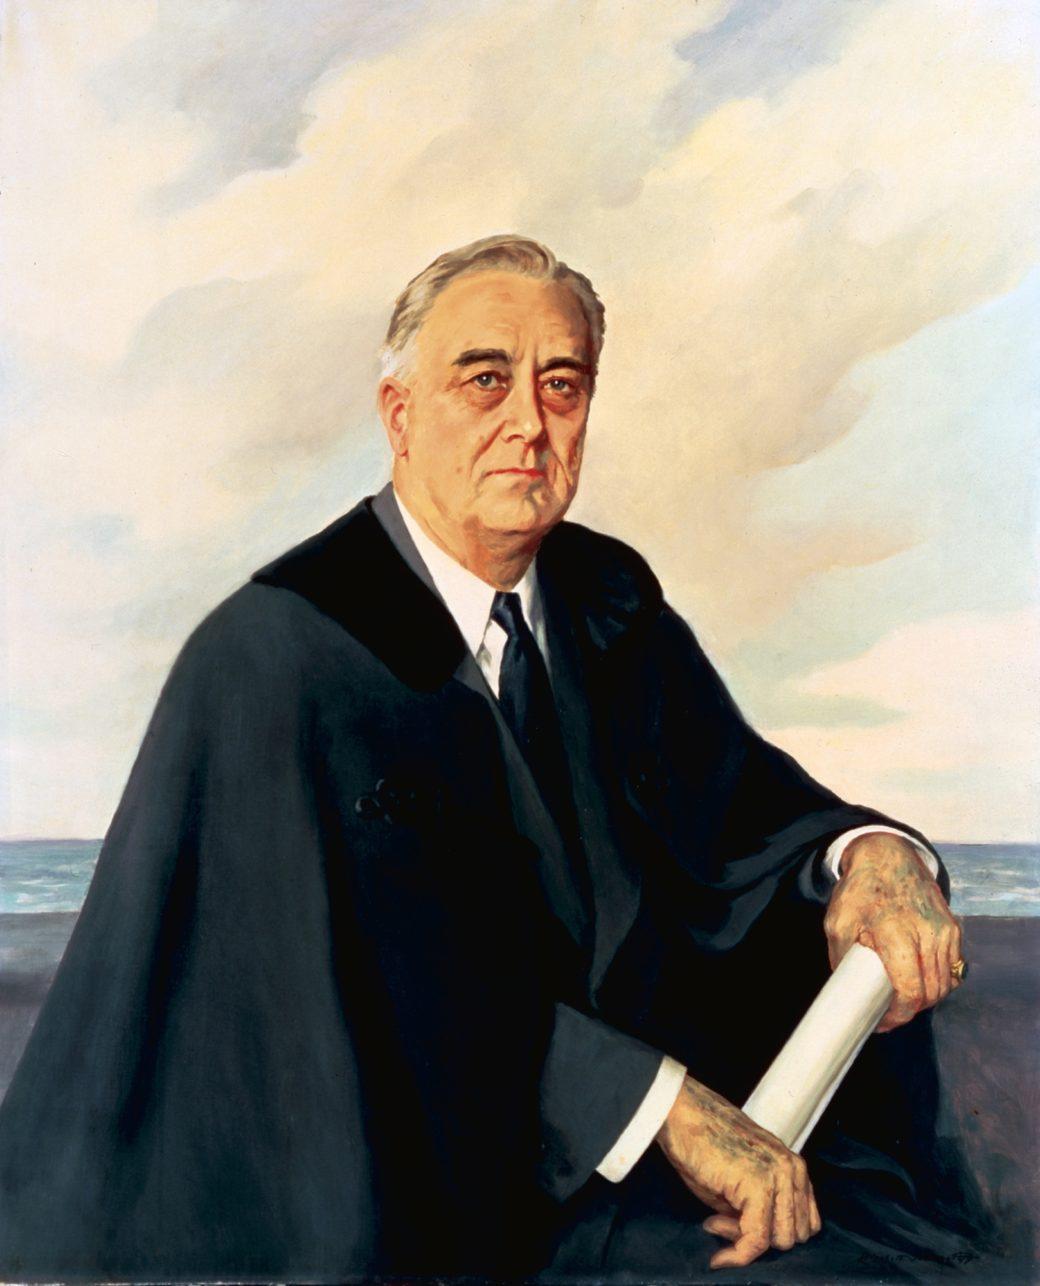 Unfinished Portrait Of Franklin D Roosevelt : unfinished, portrait, franklin, roosevelt, Franklin, Roosevelt, Portrait, White, House, Historical, Association